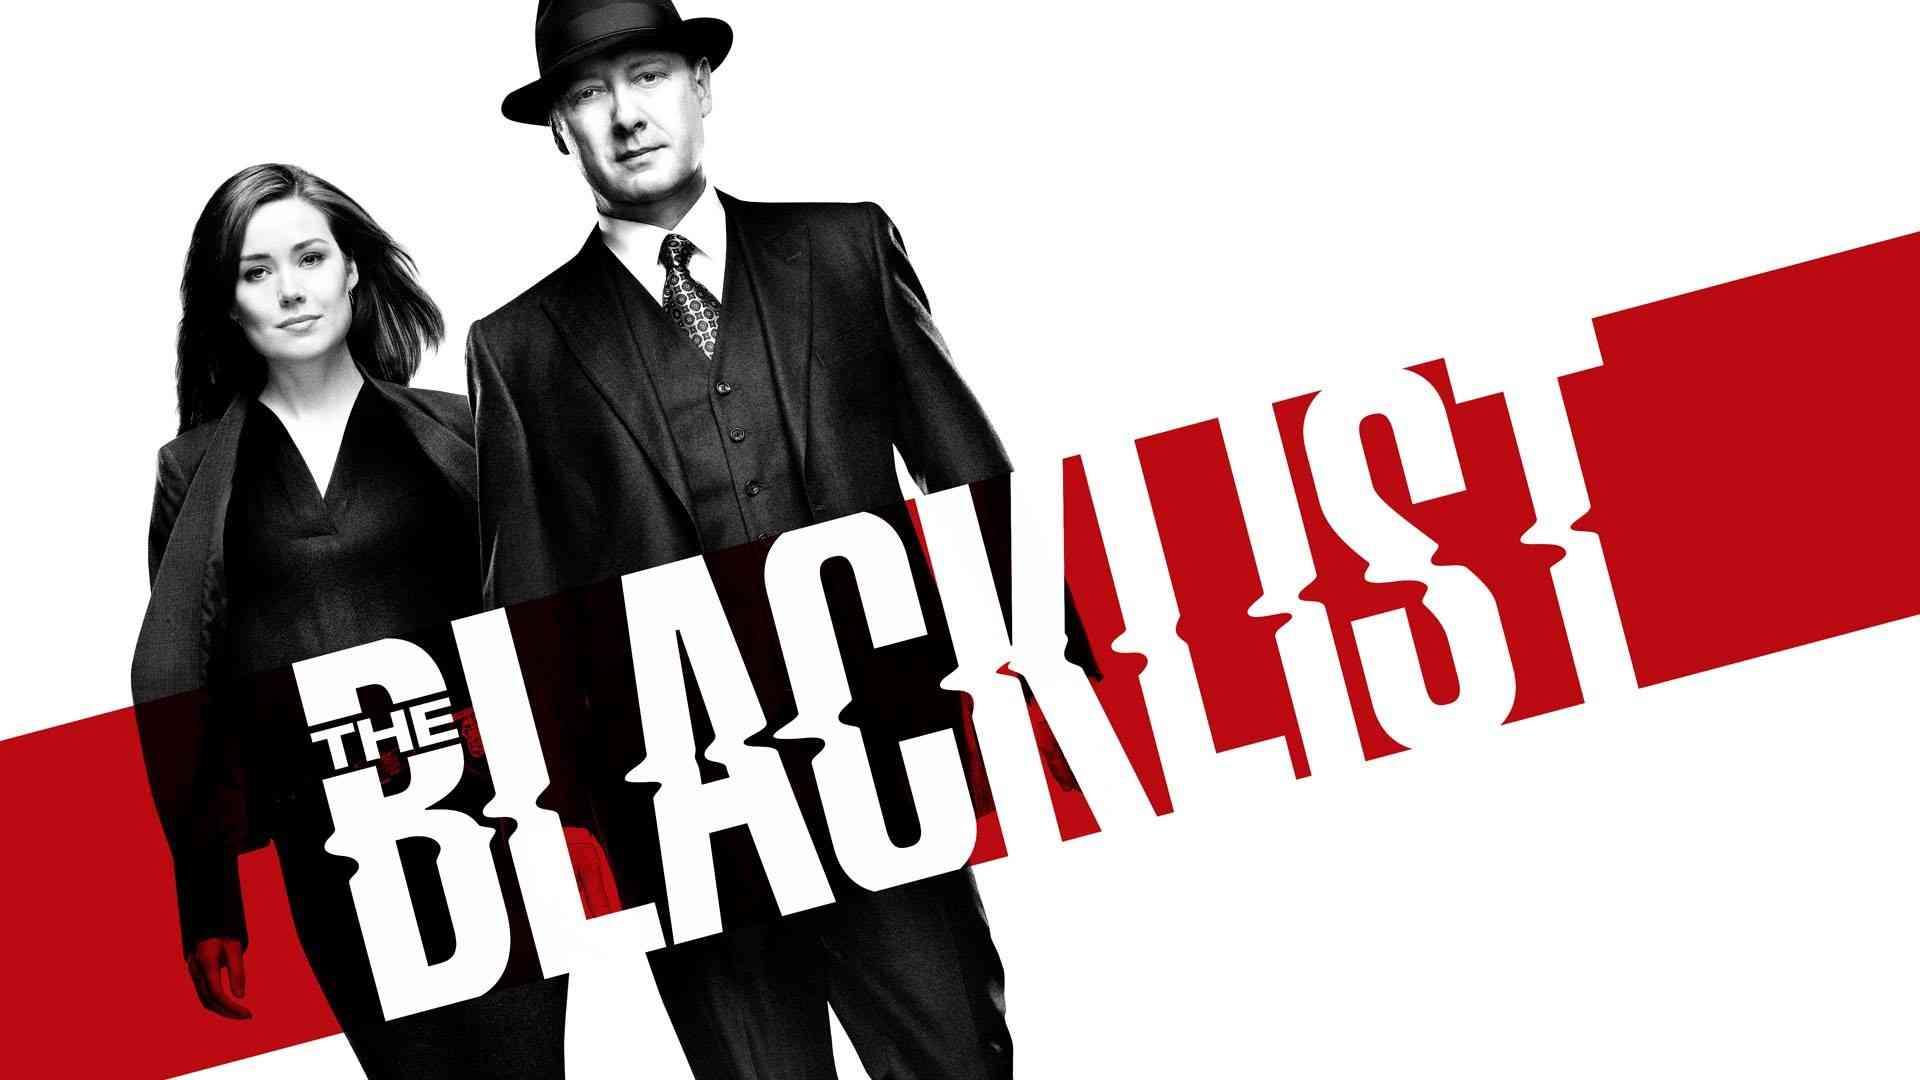 Preview: The Blacklist Season 8 Episode 22